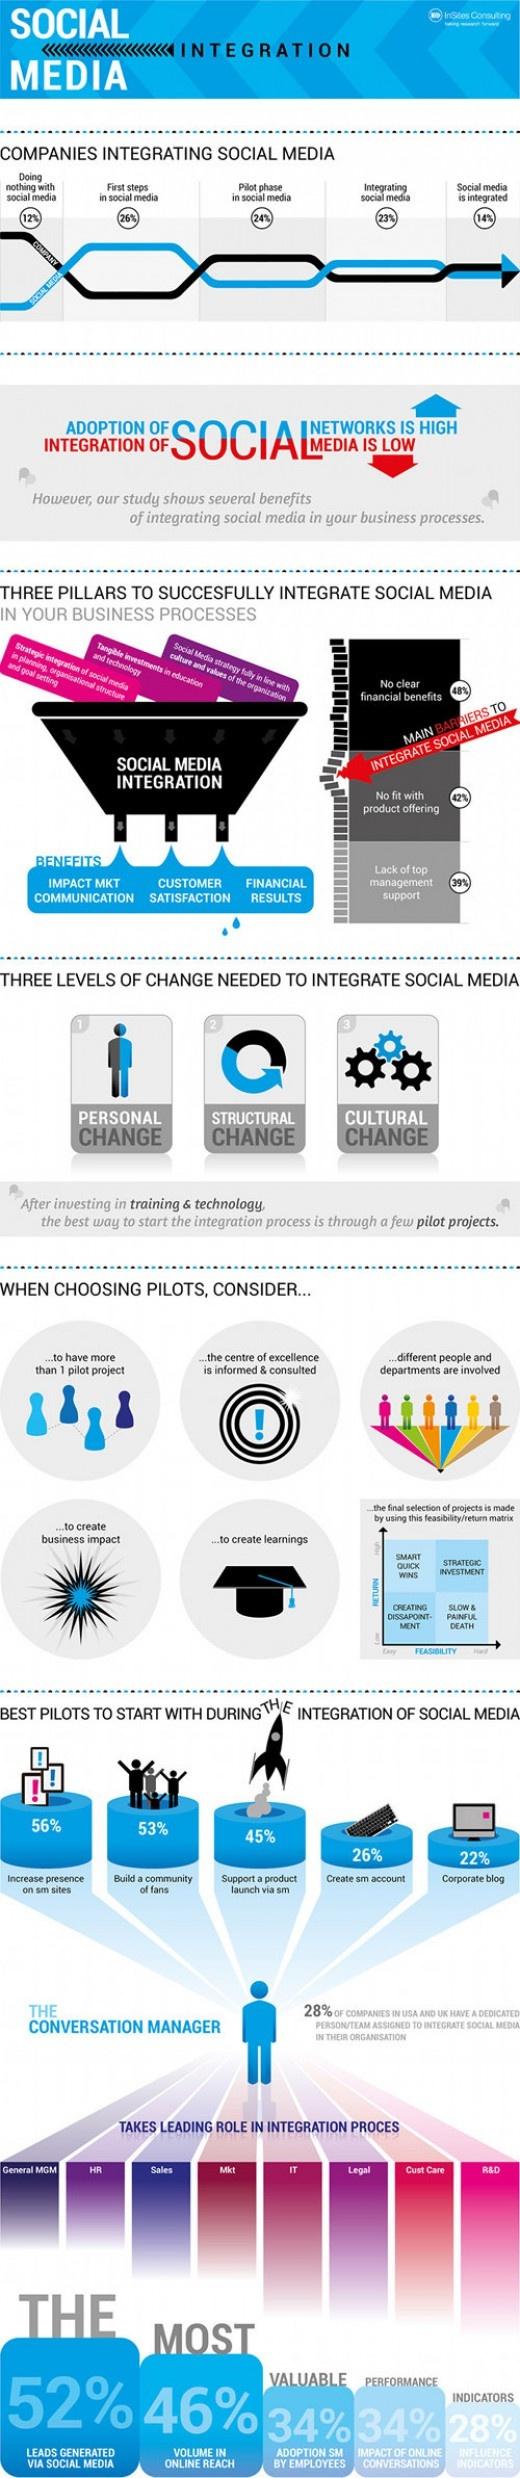 3 Stufen der Social Media Integration: Personal, Struktur & Unternehmenskultur [Infografik]